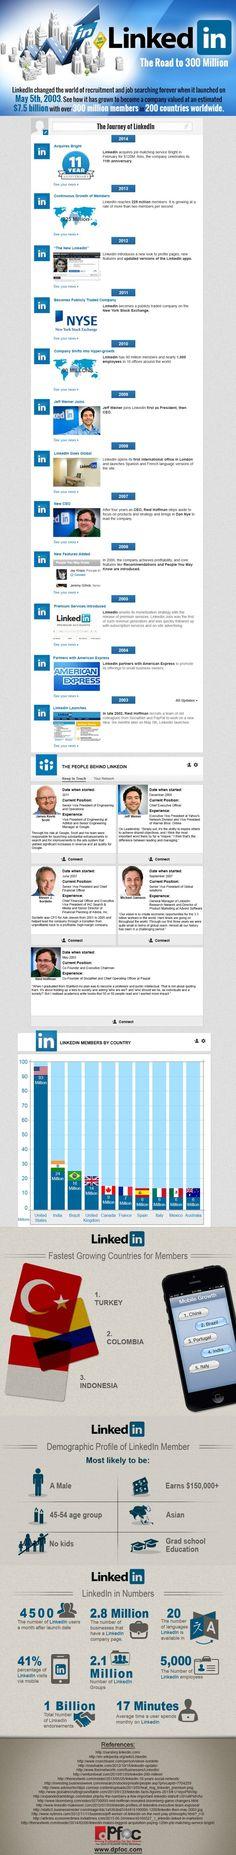 79 Best LinkedIn images in 2019 | Galaxy phone, Linkedin